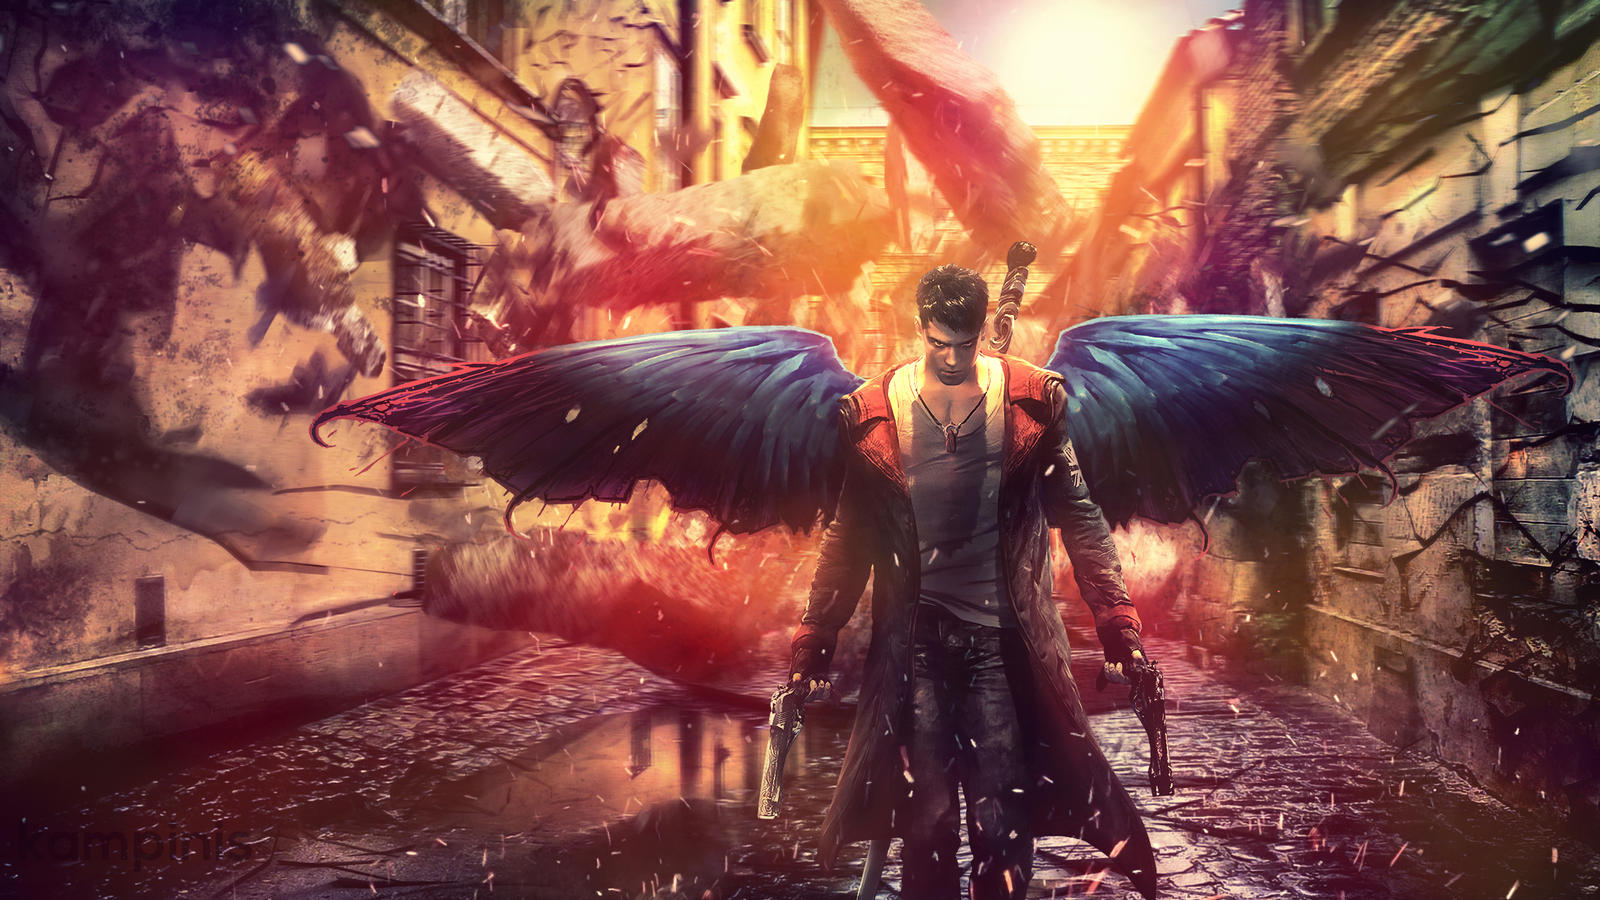 Dmc Devil May Cry Dante Wings Wallpaper By Kampinis On Deviantart